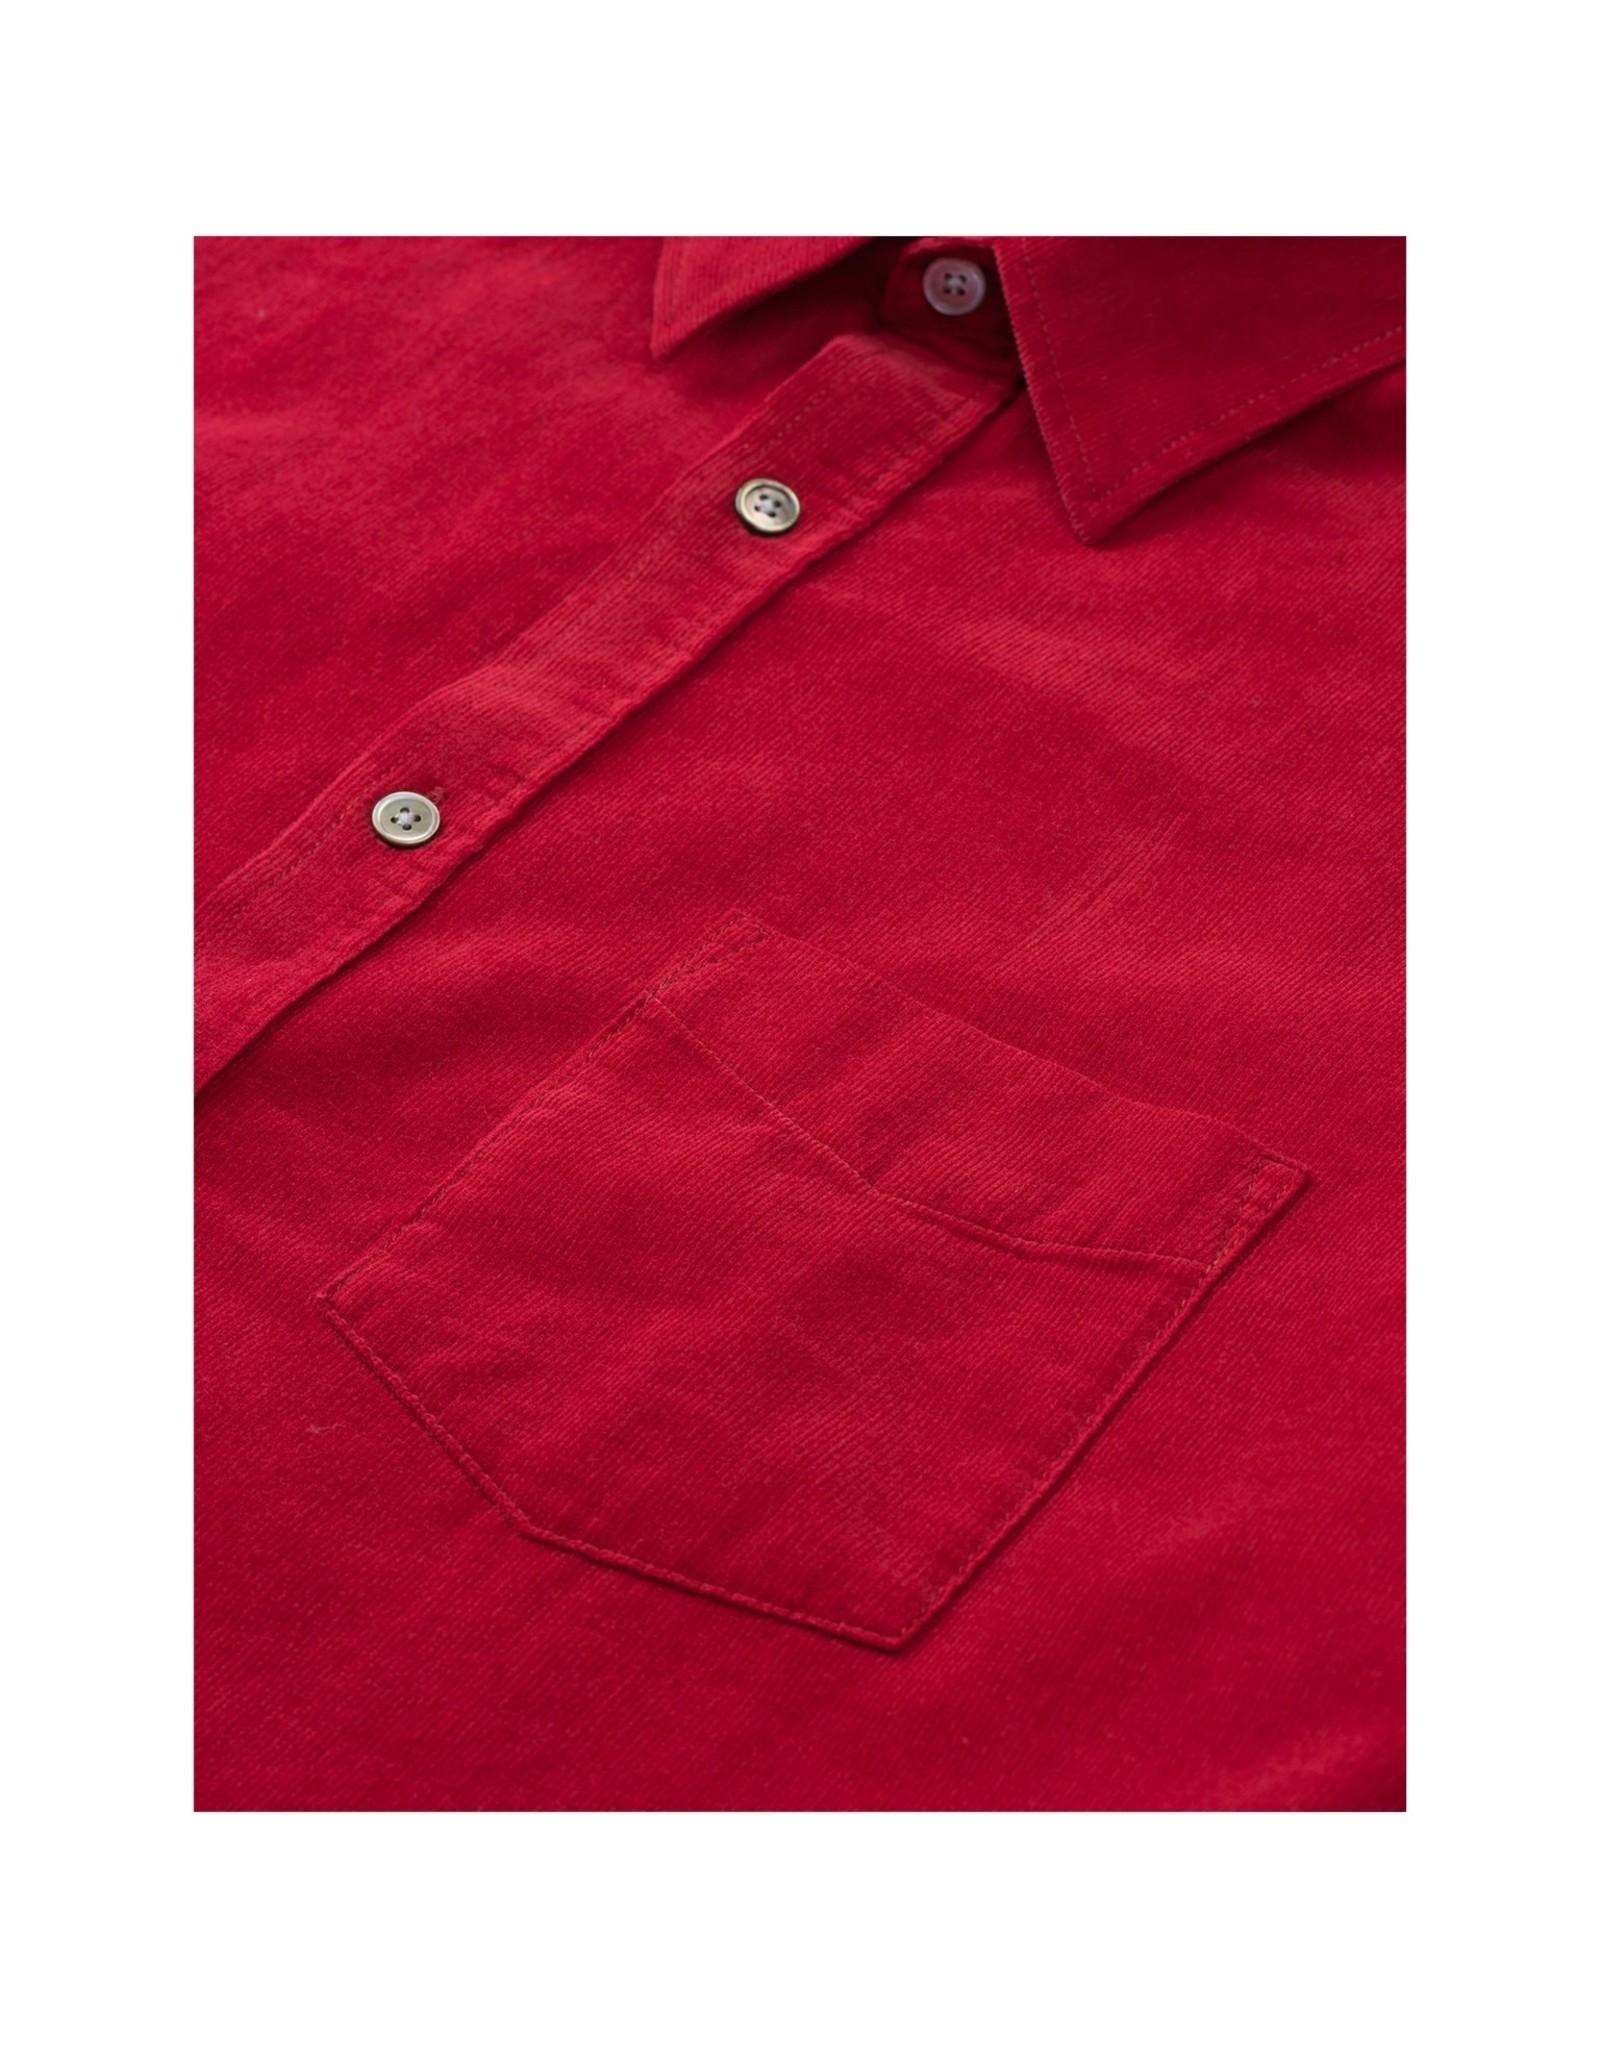 Svantini Blouse Red